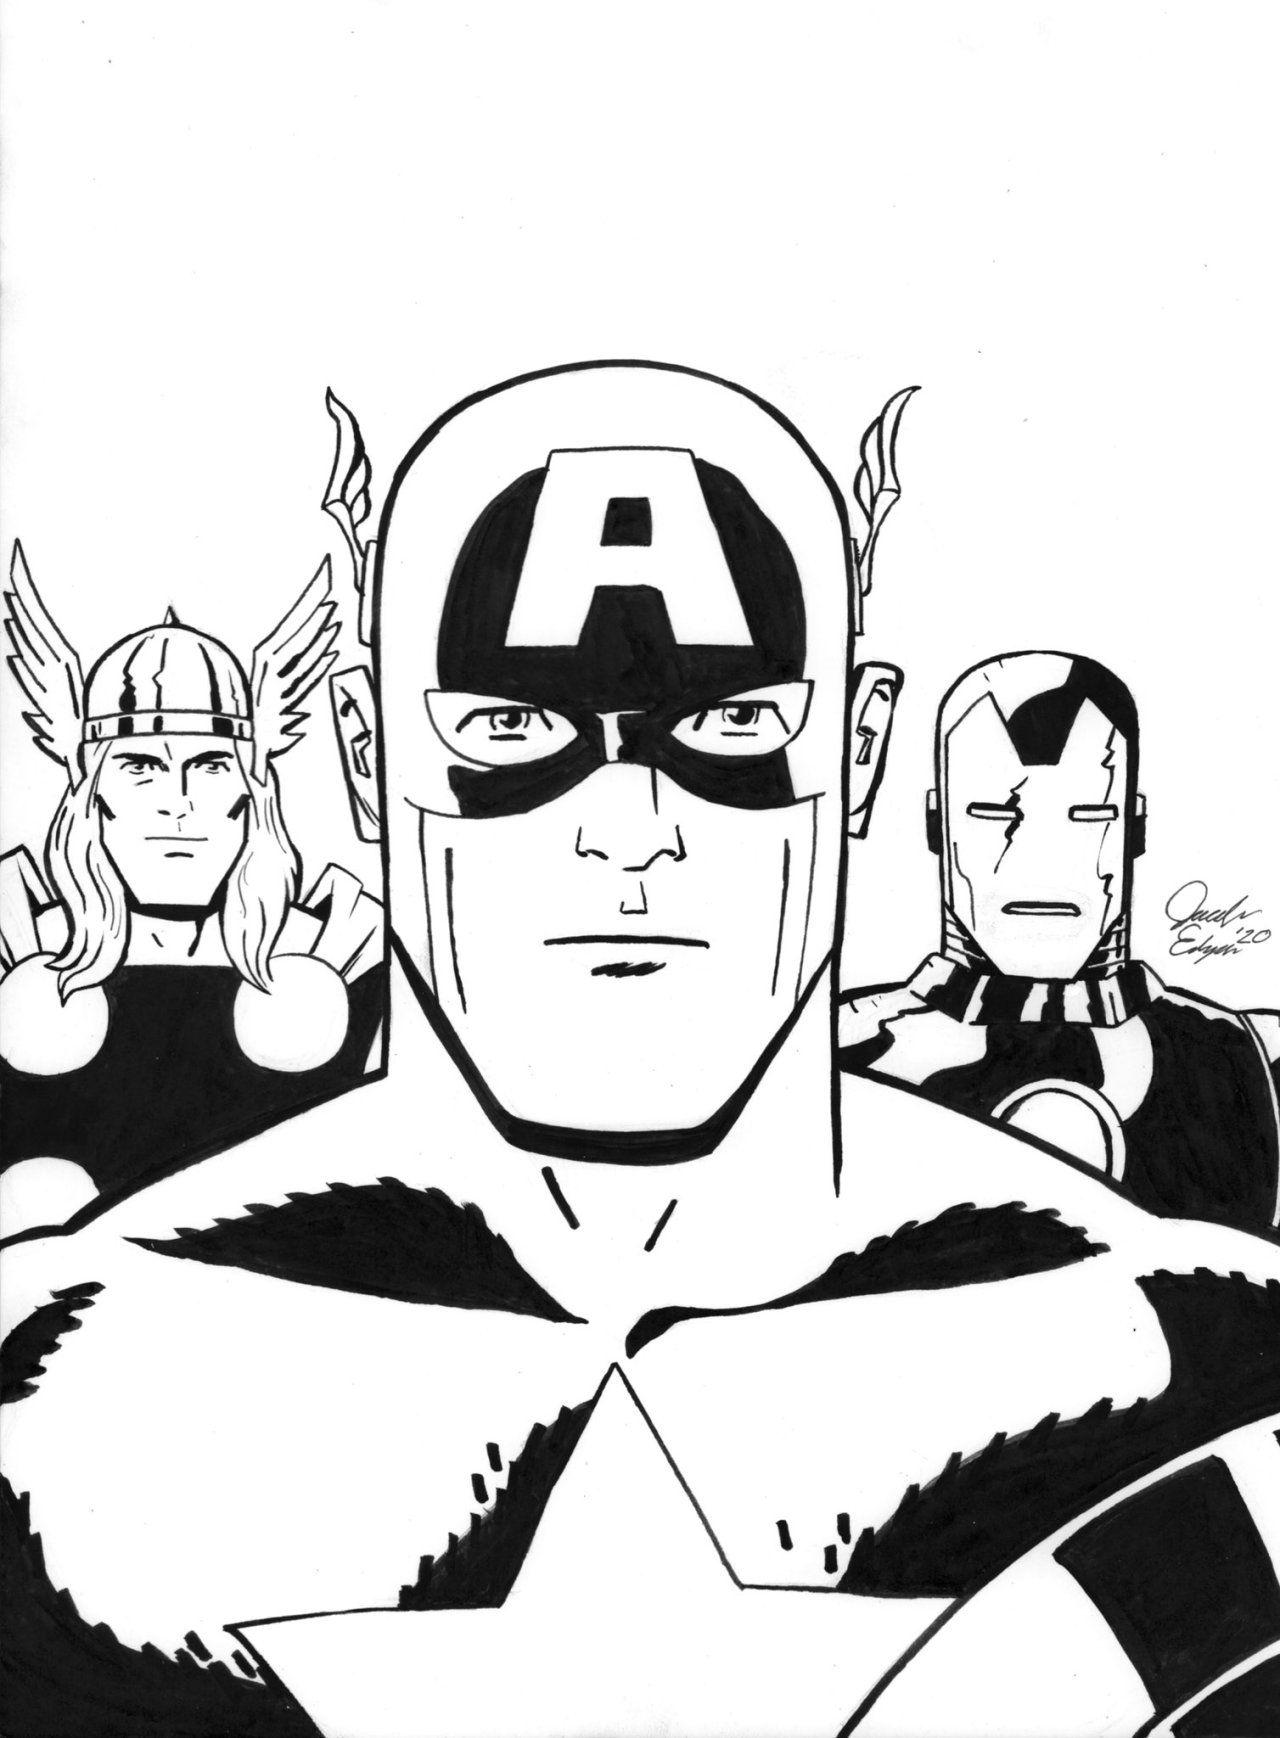 Comic Art Showcase Captain America Thor And Iron Man By Jacob Edgar In 2021 Iron Man Comic Art Man